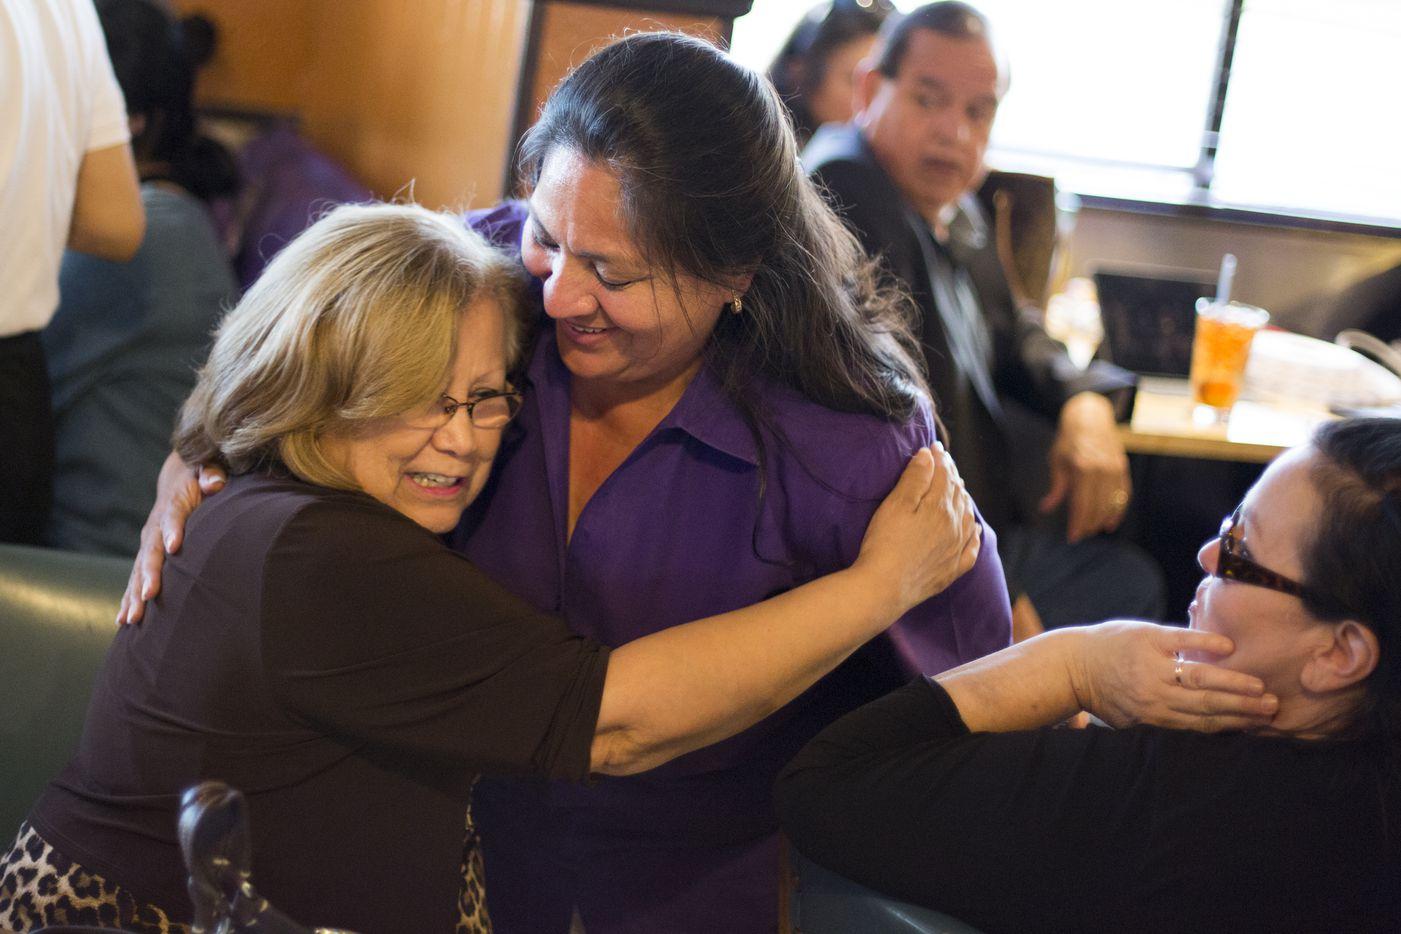 Julia Suarez-Macias (left) hugs Monica Alonzo, Dallas City Councilwoman representing District 6, during an election night party May 6, 2017, at Buena Vista Restaurant in Dallas, Texas.